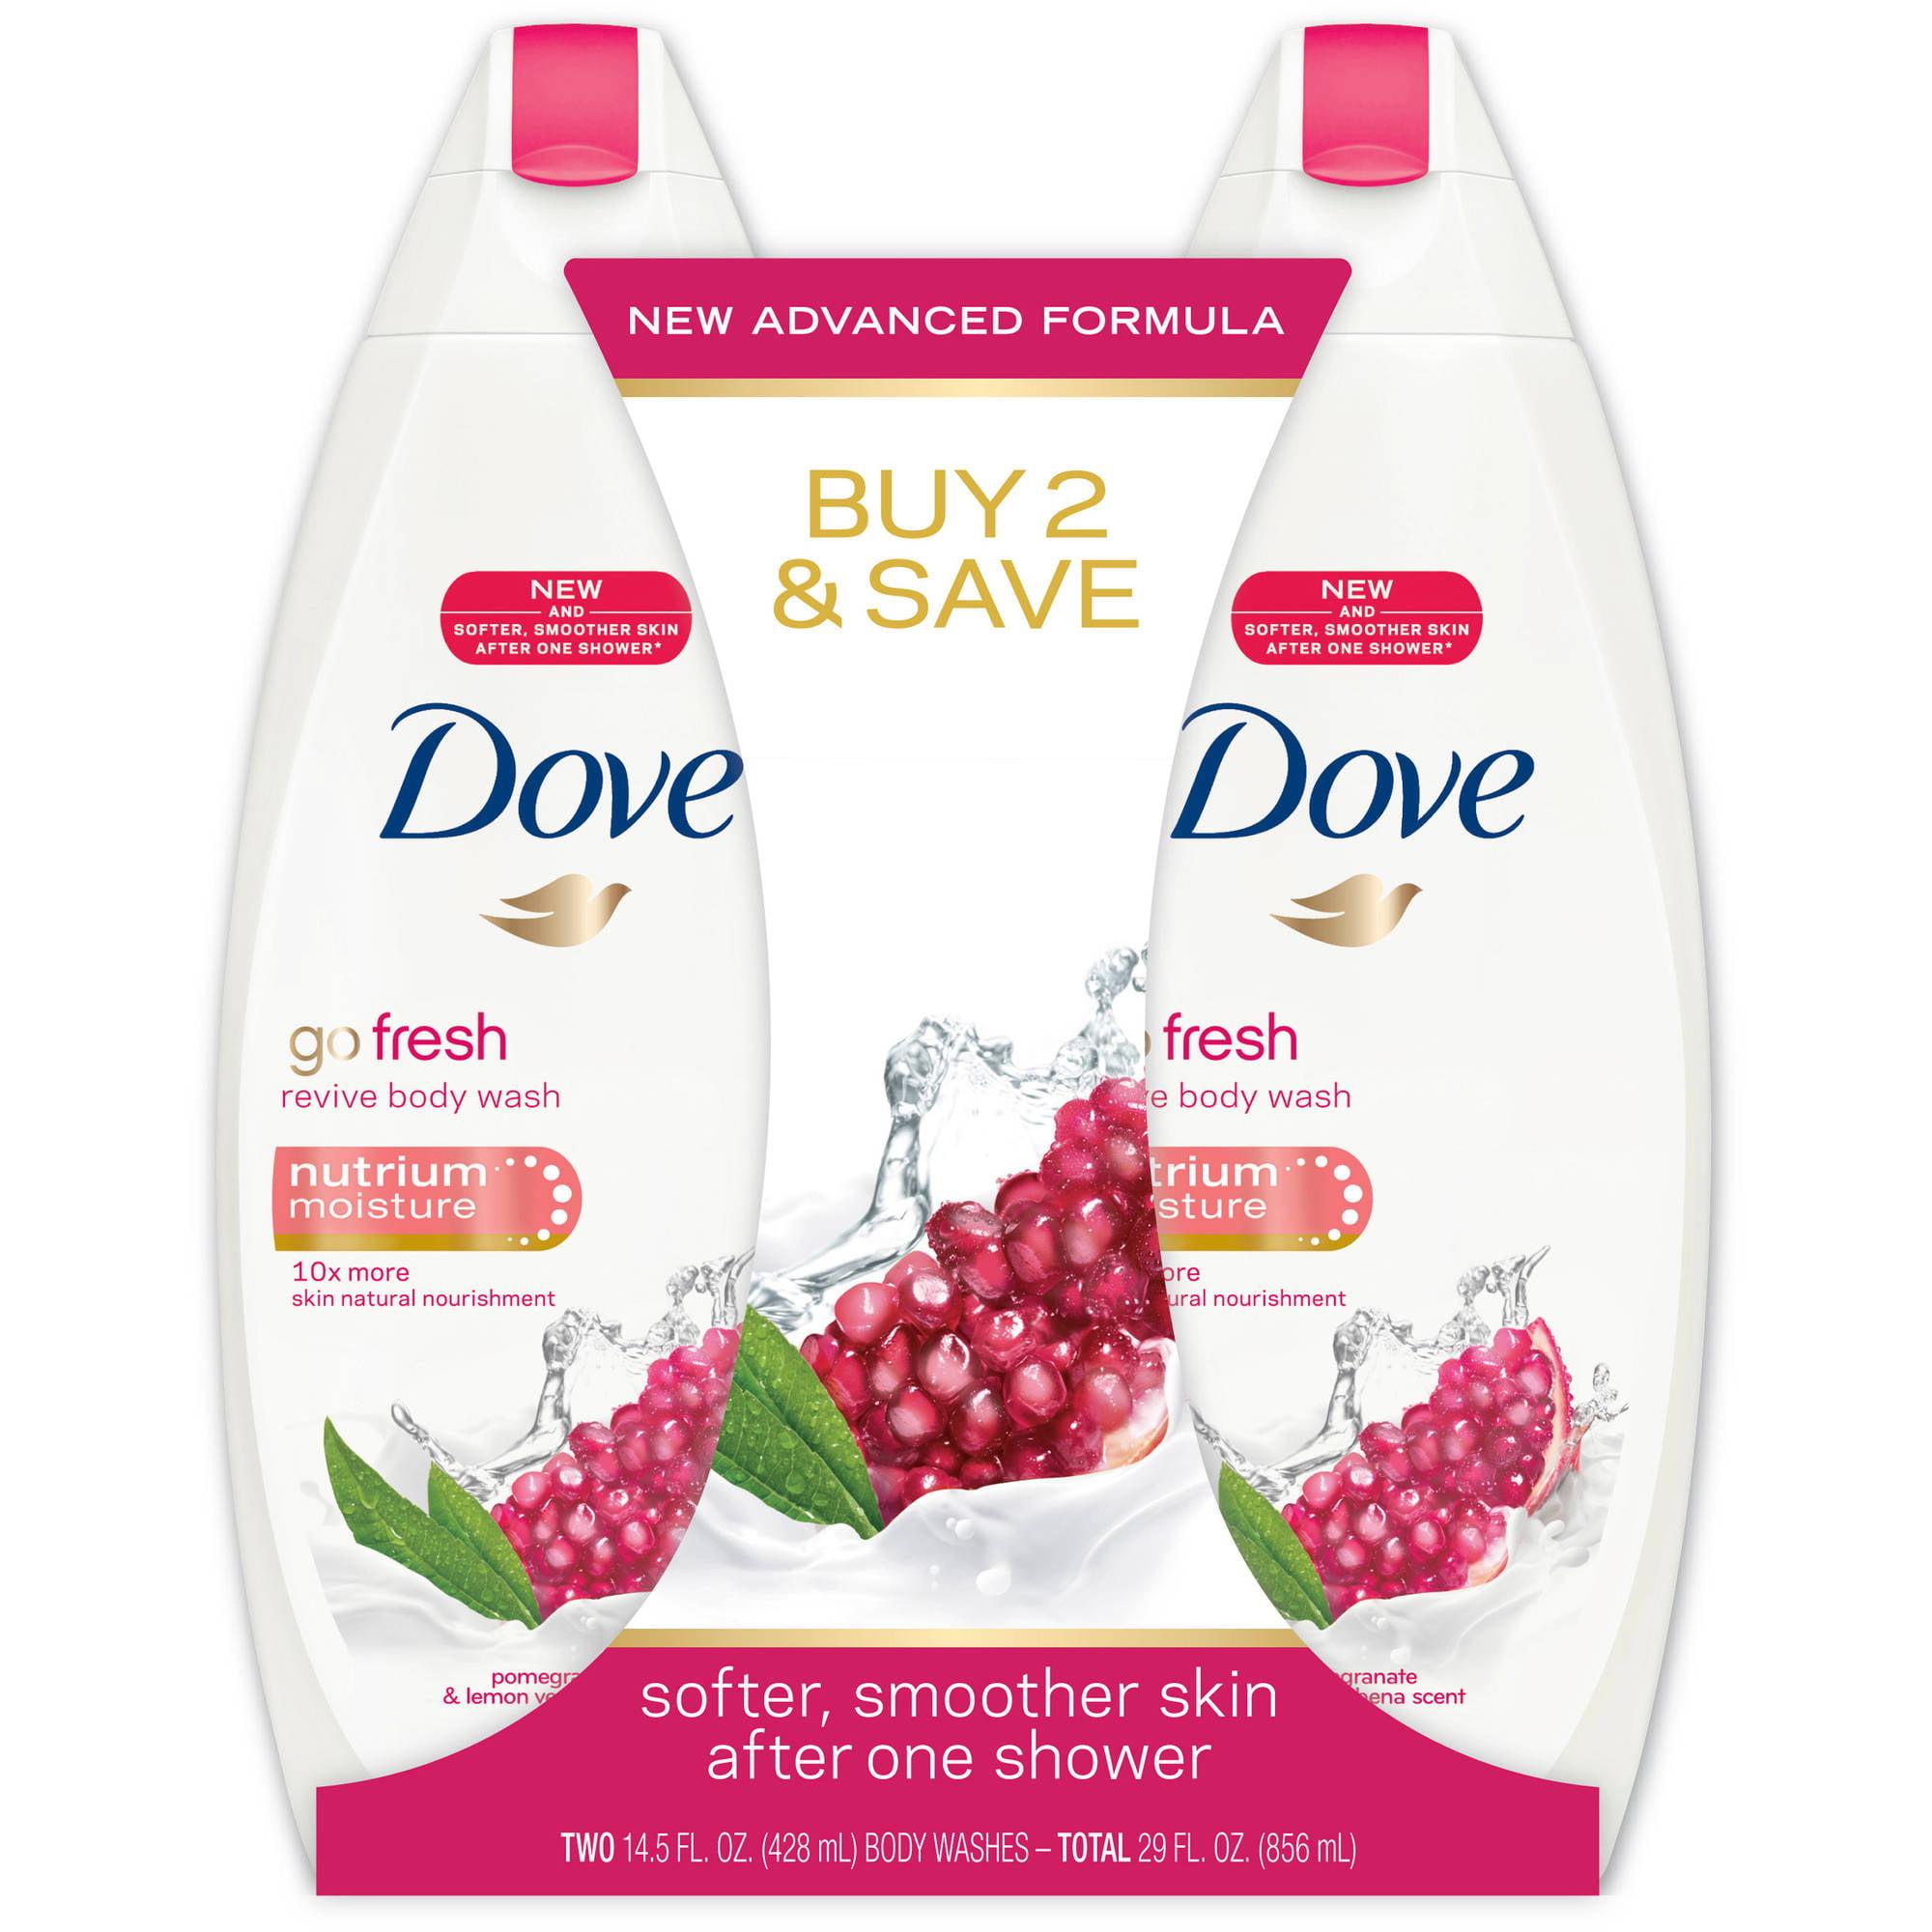 Dove go fresh Revive Body Wash, 14.5 oz, Twin Pack